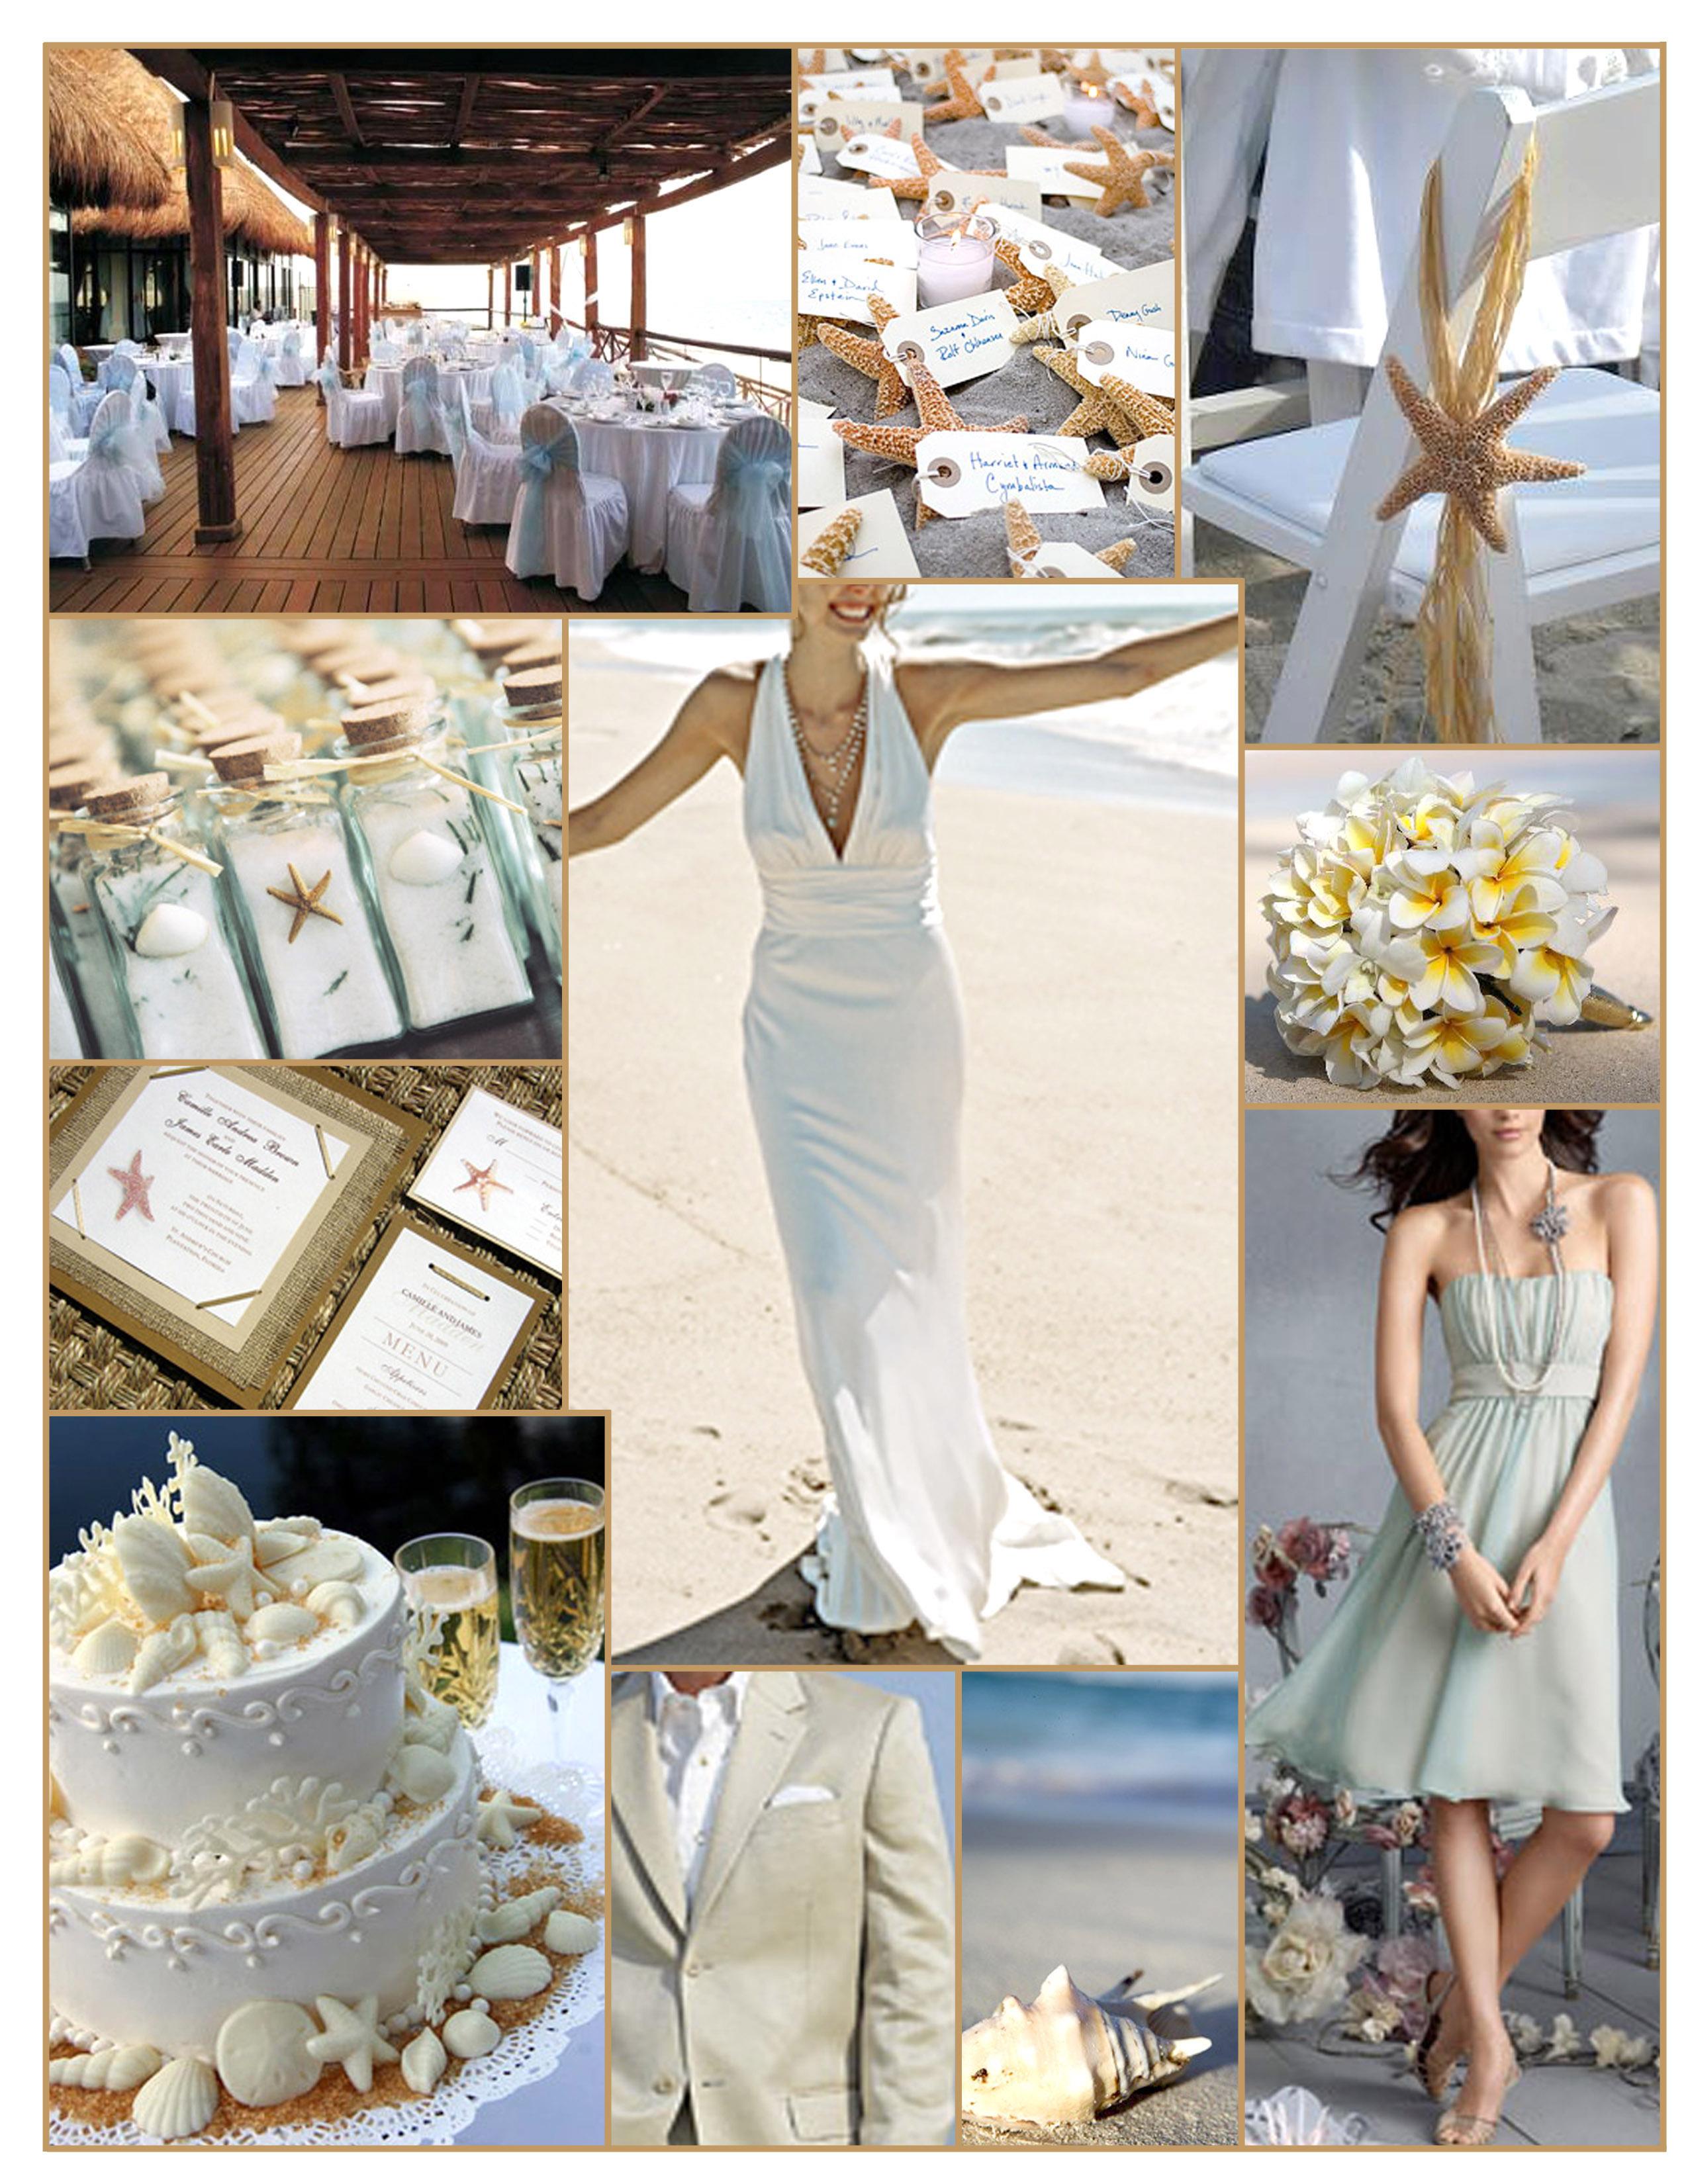 white, yellow, blue, Starfish, Plumeria, Seashells, Sand, Inspiration board, Nicole miller, Beach wedding, Frangipani, Jim hjelm occasions, Seashell cake